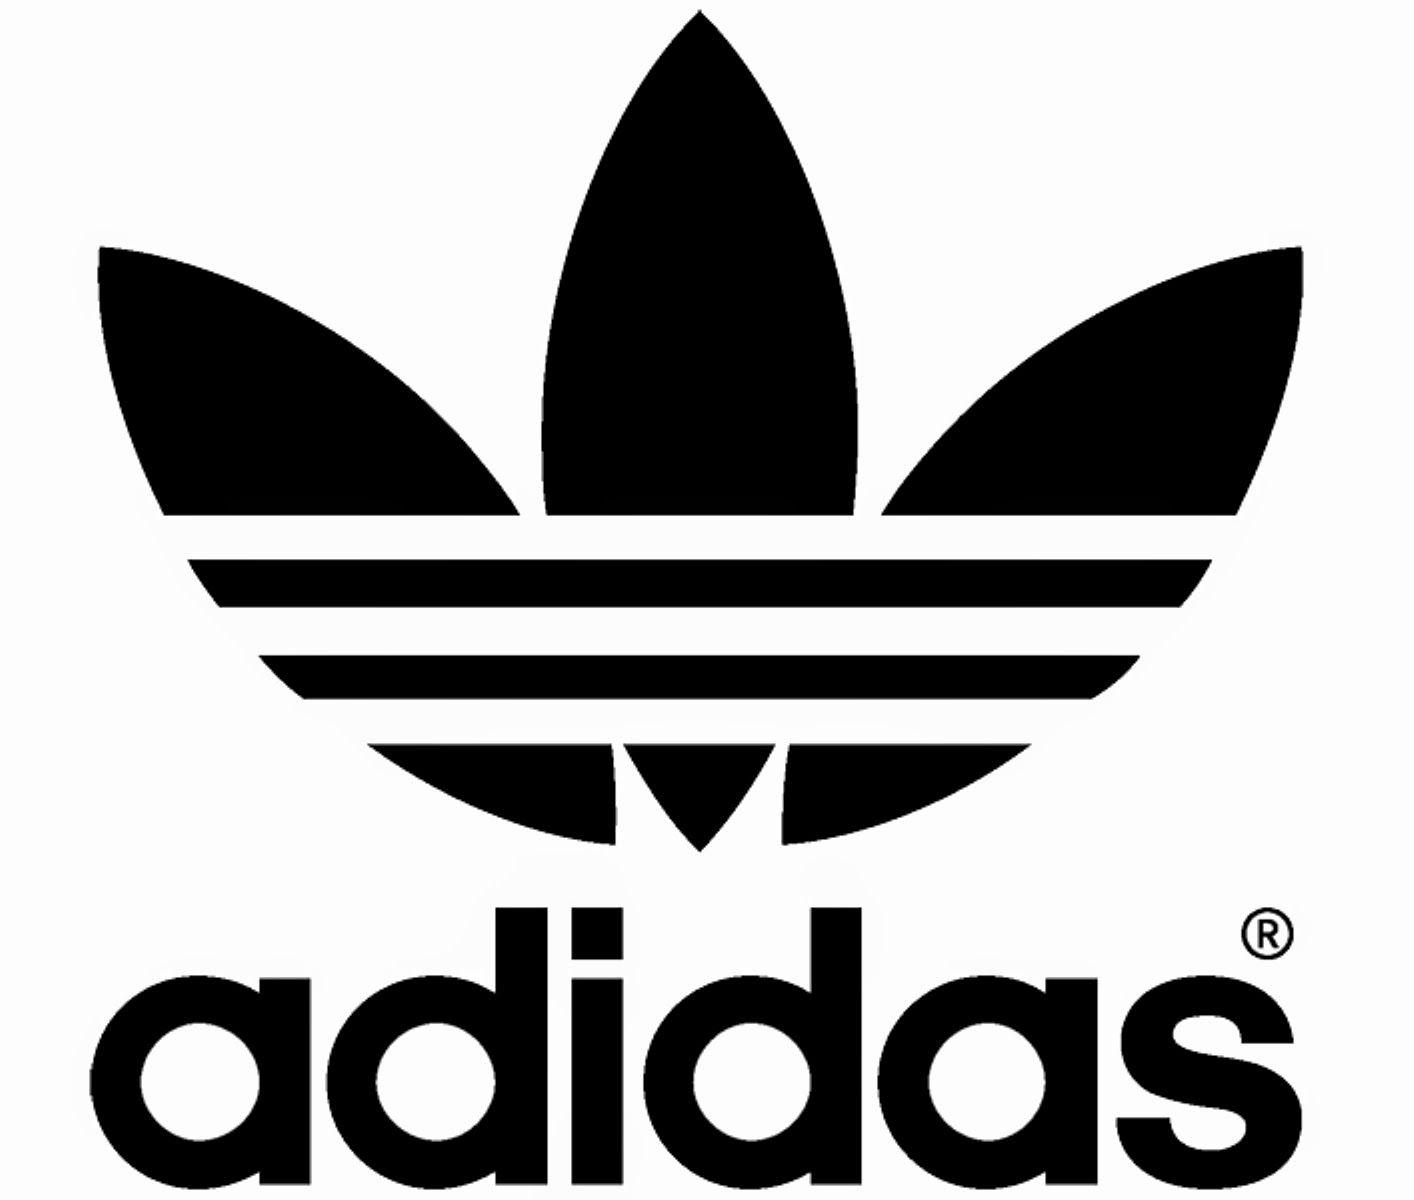 Idea by tonya k on cameo silhouette adidas originals